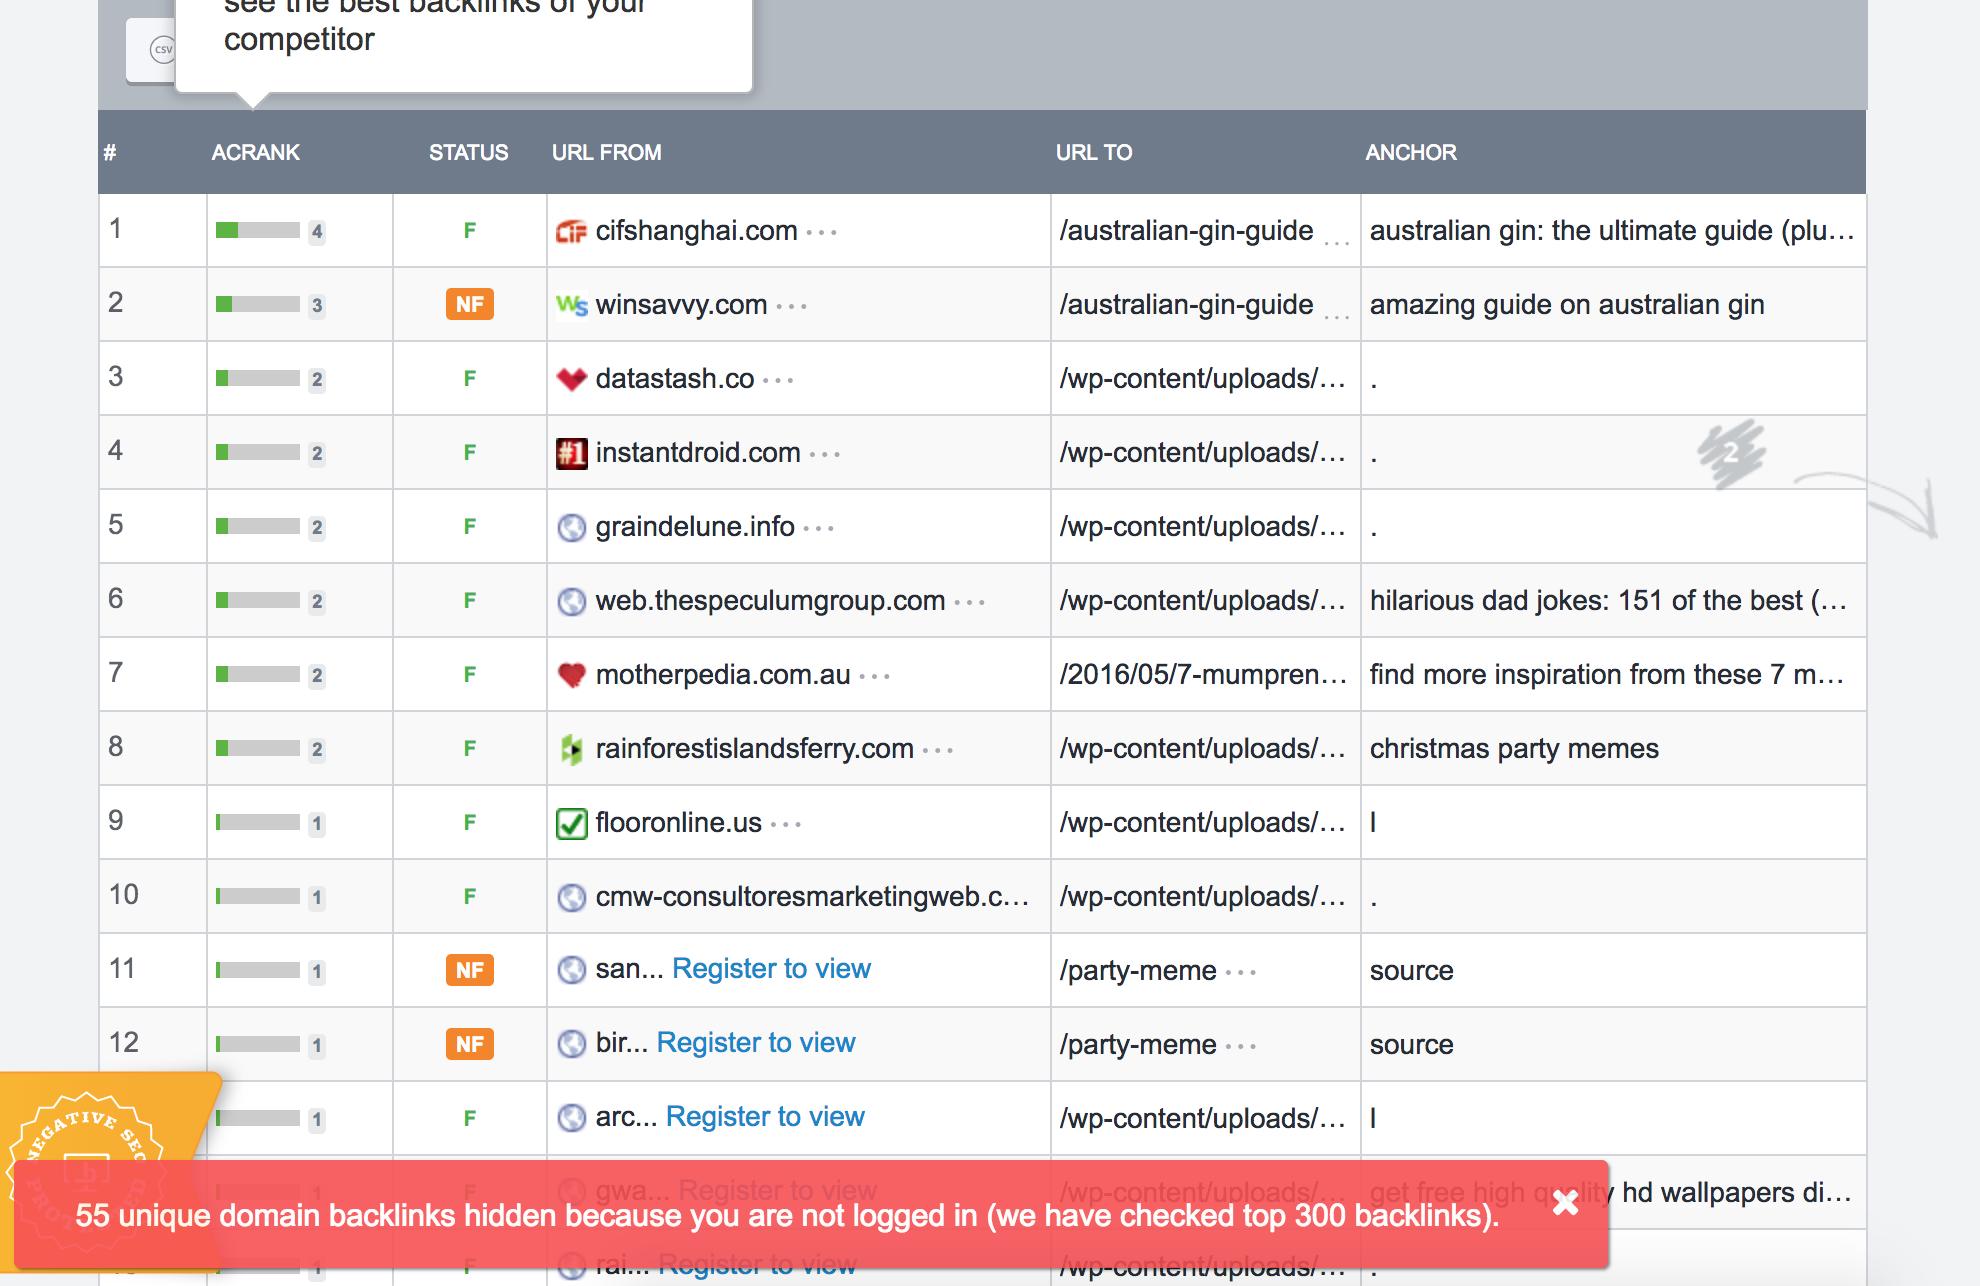 backlinking netlinking externe e-commerce seo guide smartkeyword